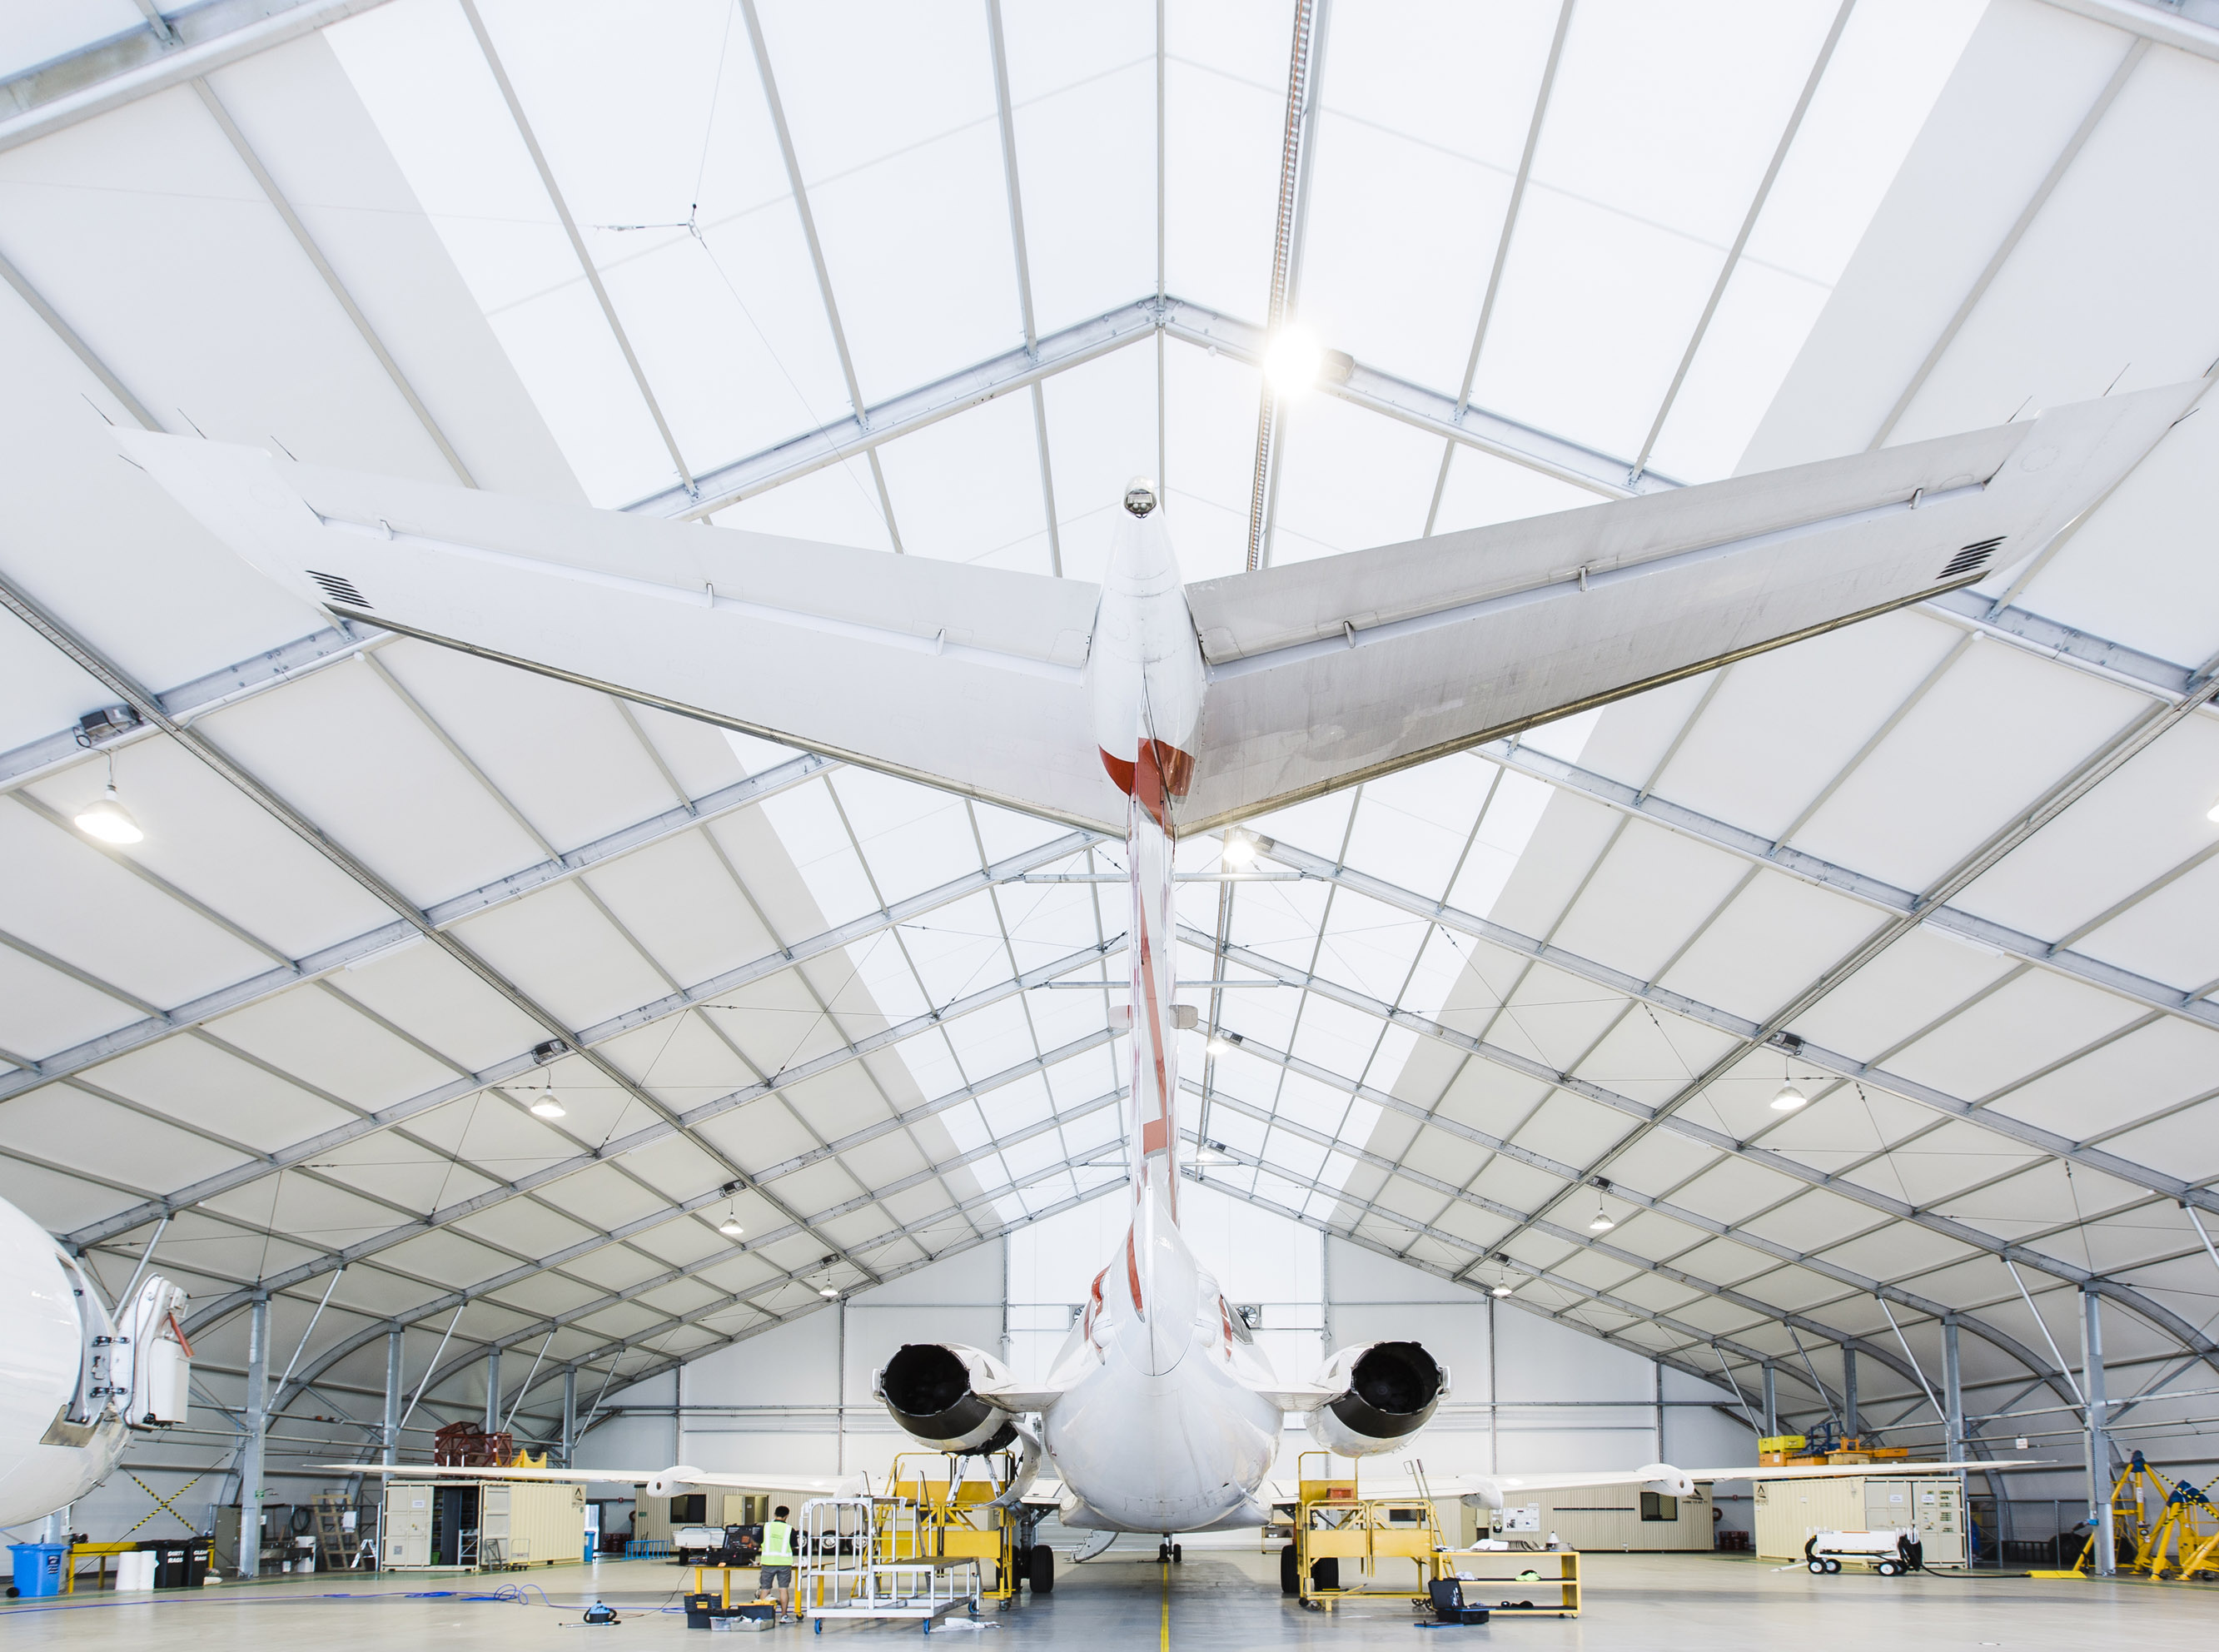 8189-virgin-hangar-pvc-2013-fs-9